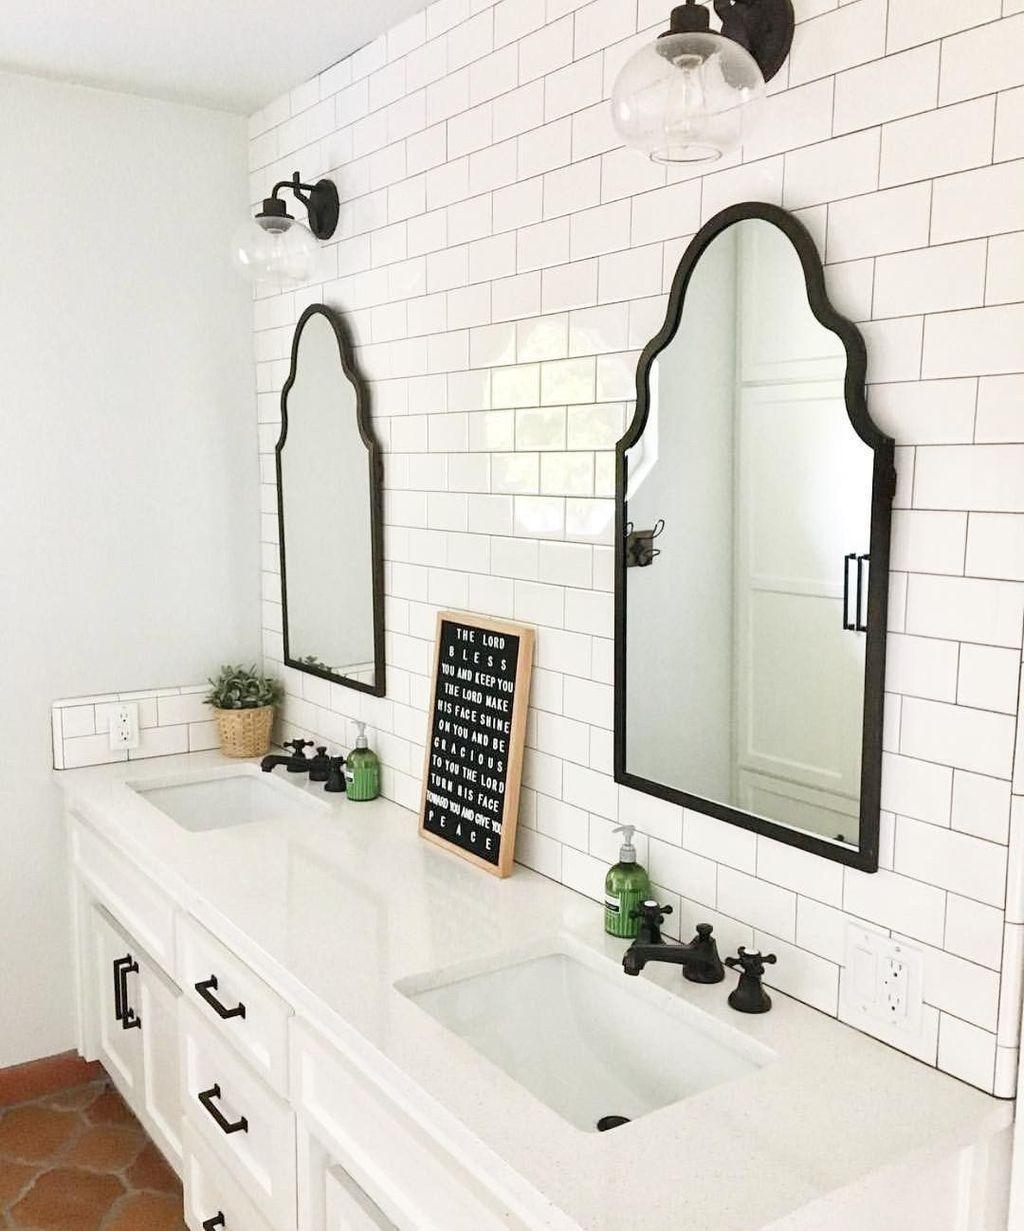 pin by clair thomson on home ideas in 2018 pinterest bathroom rh pinterest com